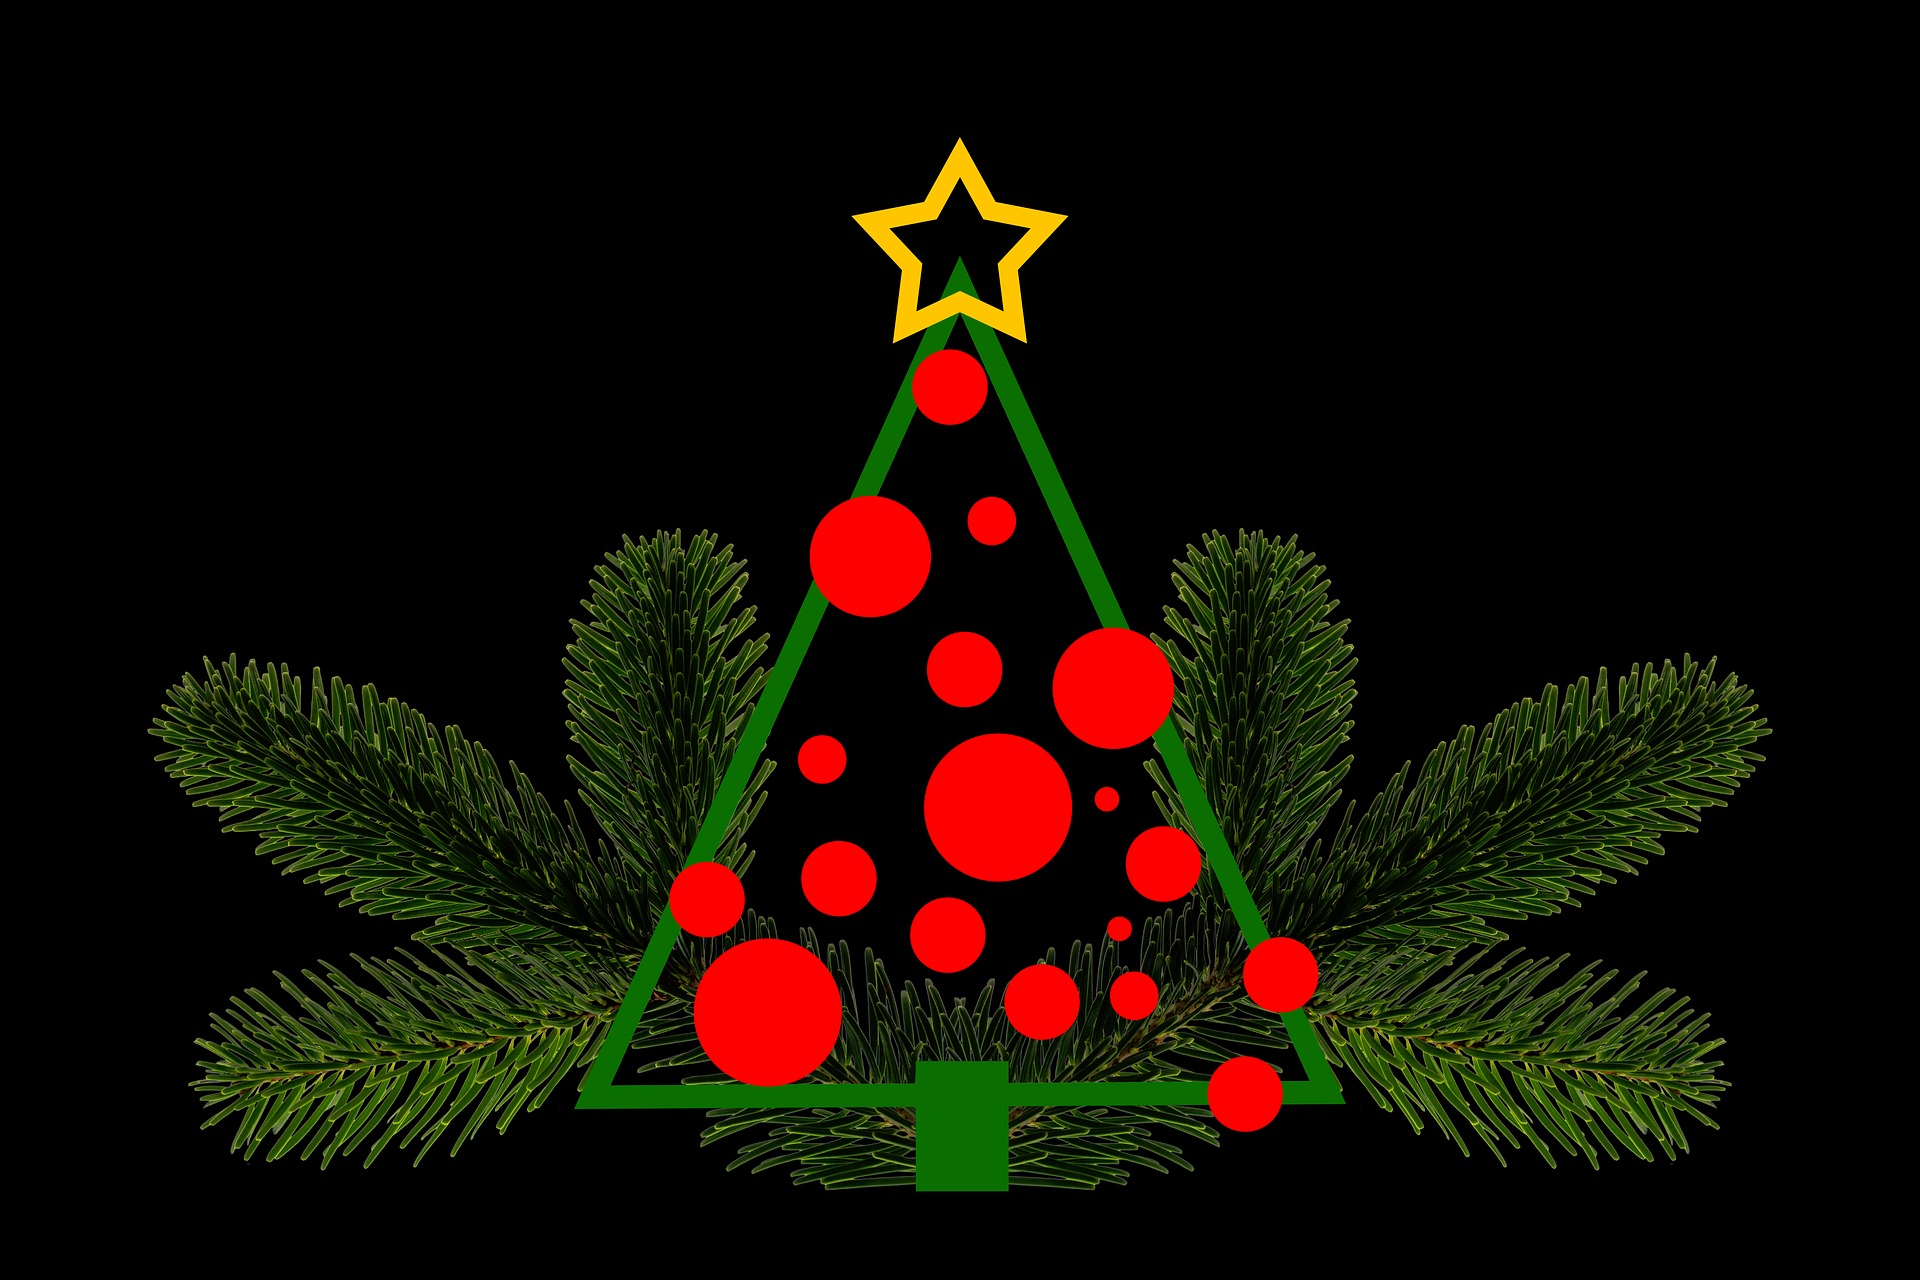 christmas-3007299_1920.jpg